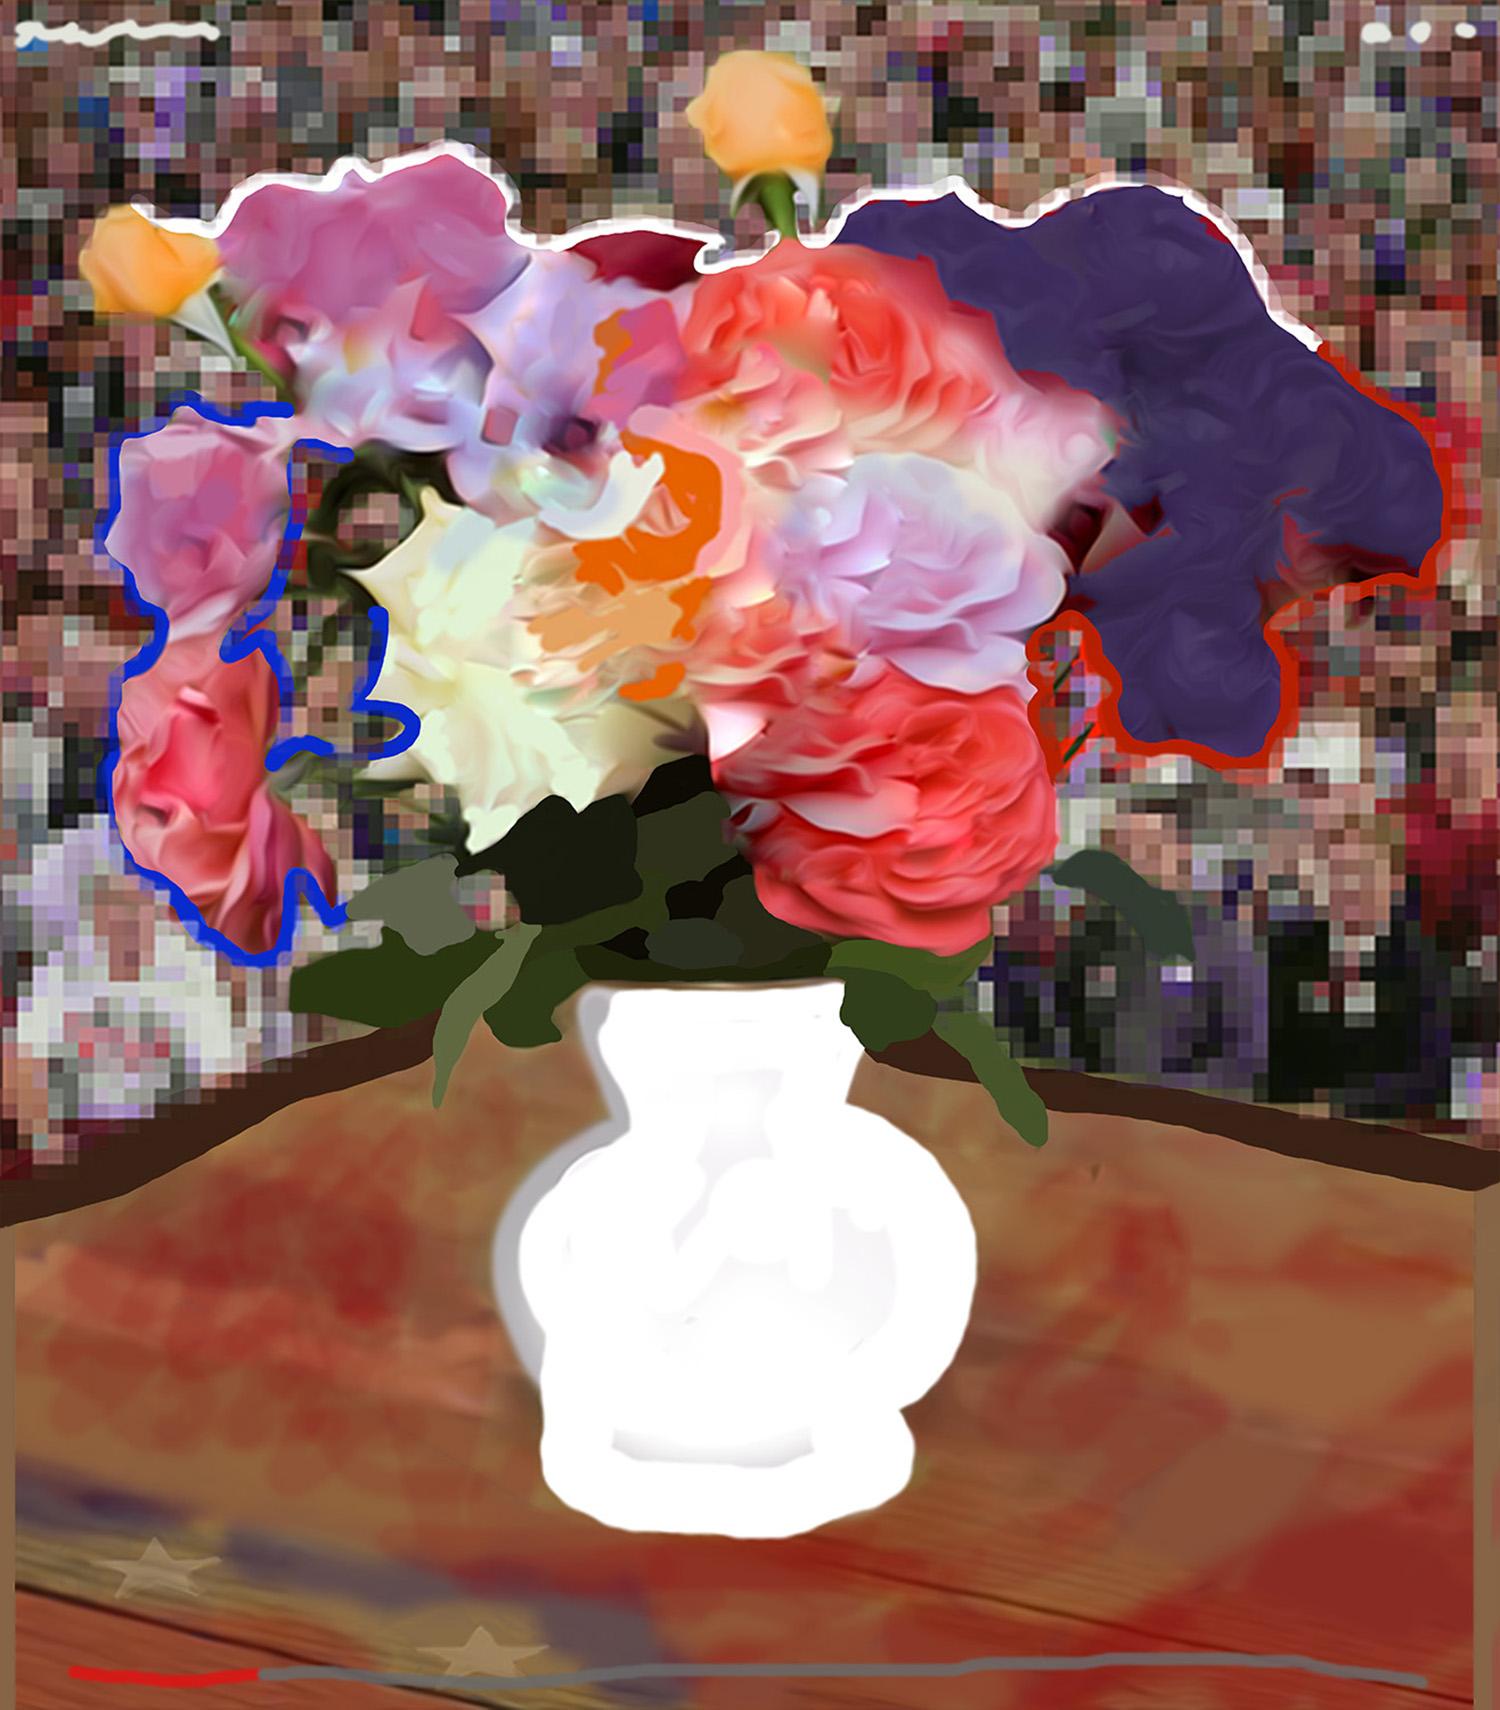 Study After Flowers for Algernon III  © Gregory Eddi Jones